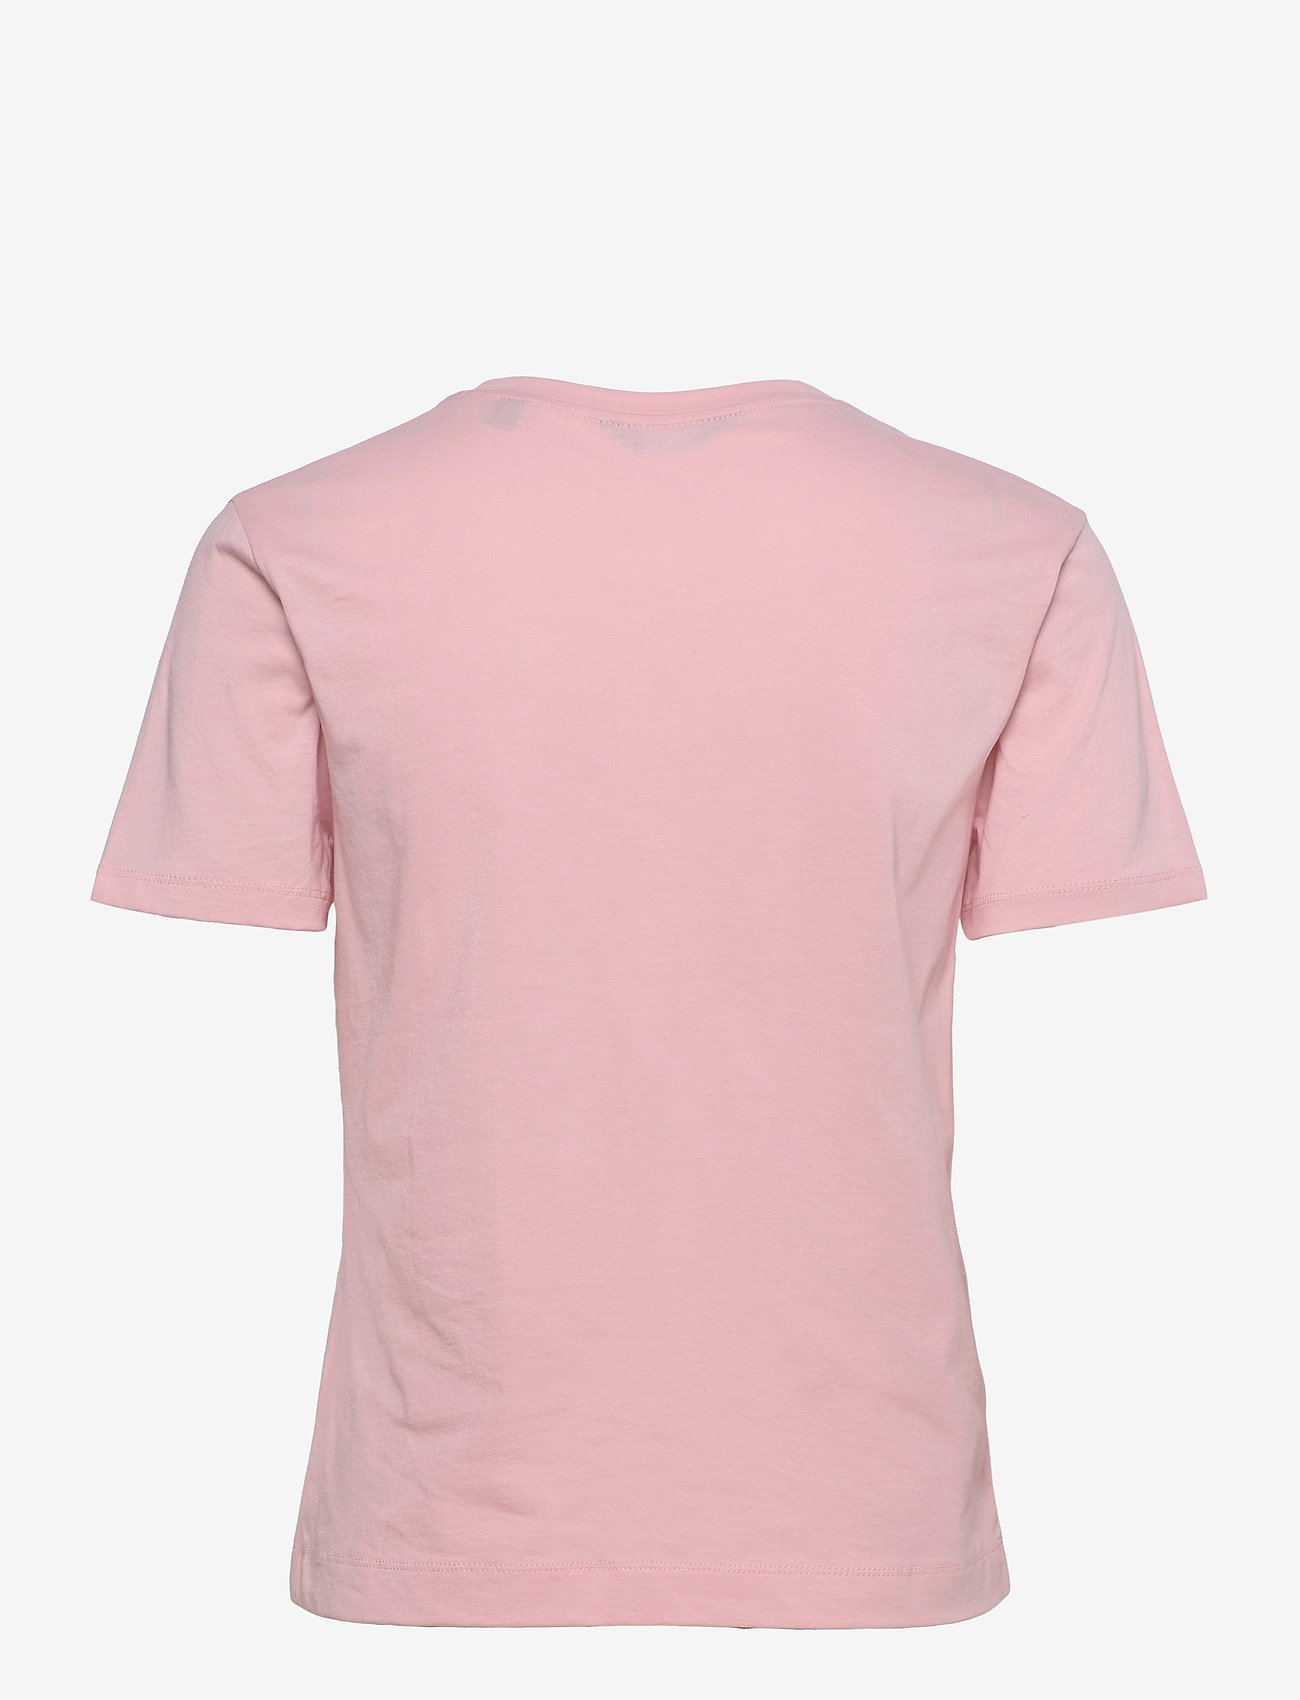 GANT - ORIGINAL SS T-SHIRT - t-shirts - preppy pink - 1